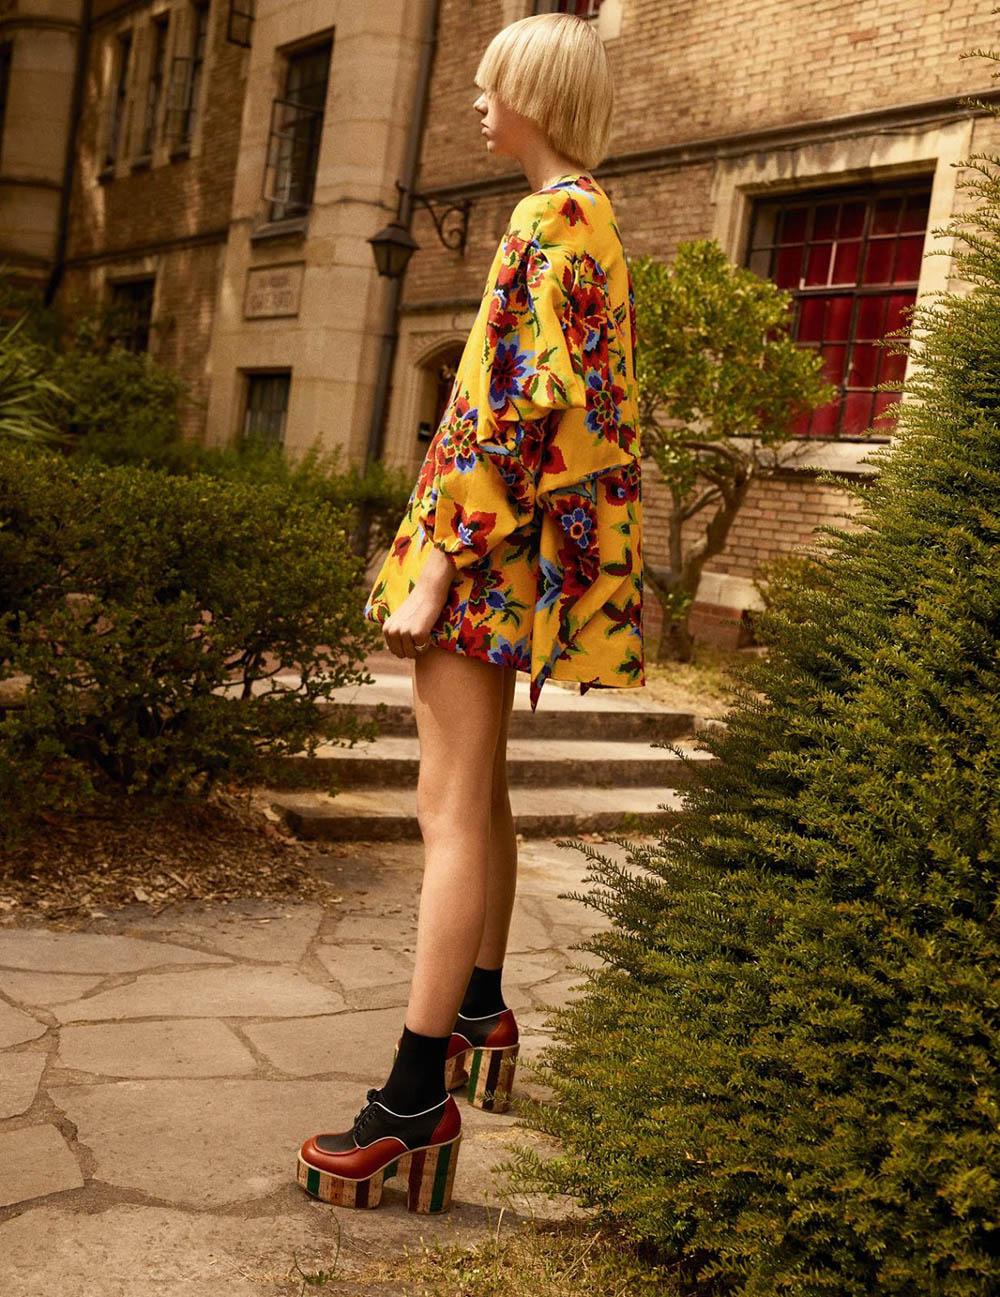 Bente Oort by Karim Sadli for Vogue Paris October 2019